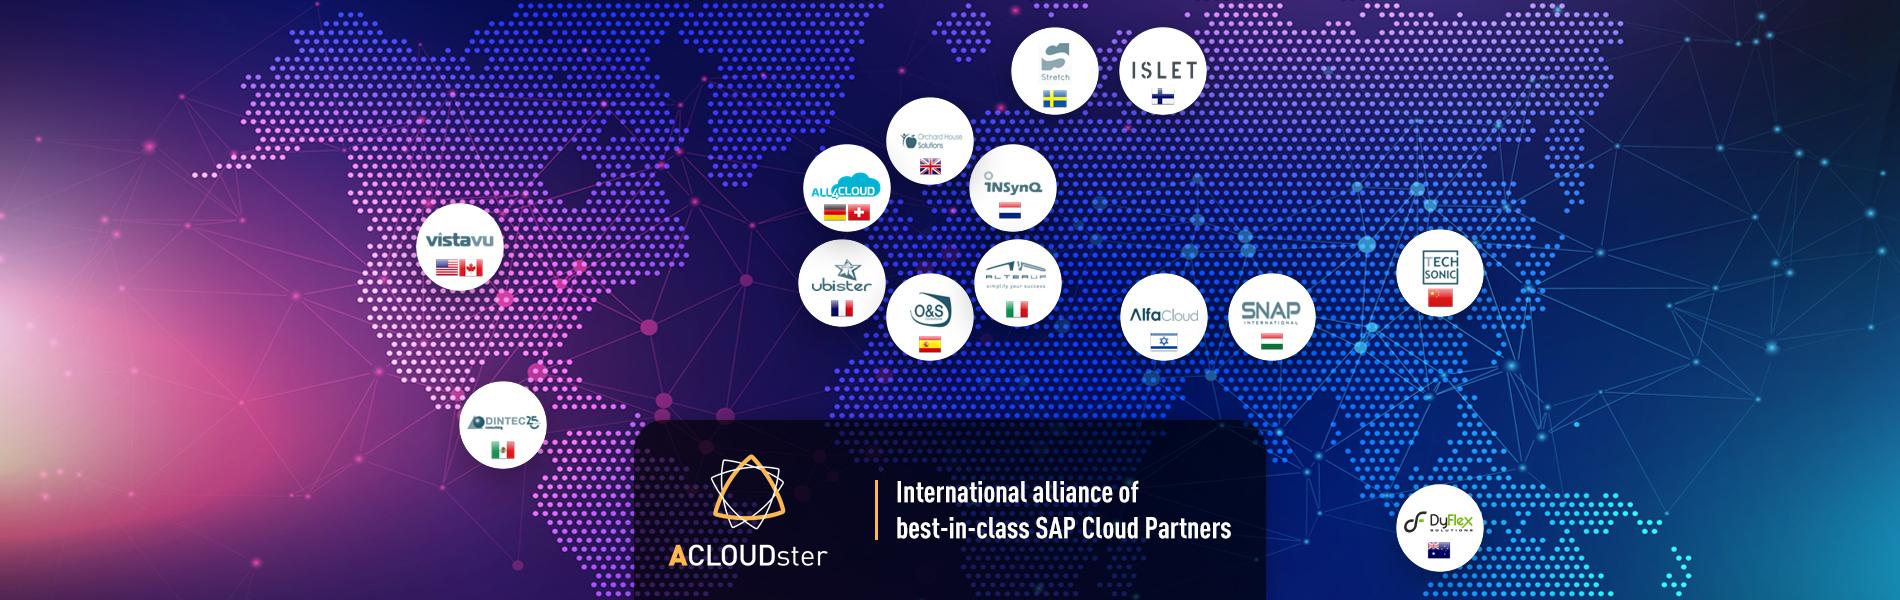 ACLOUDster, Altea UP si allea con importanti GOLD Partner SAP